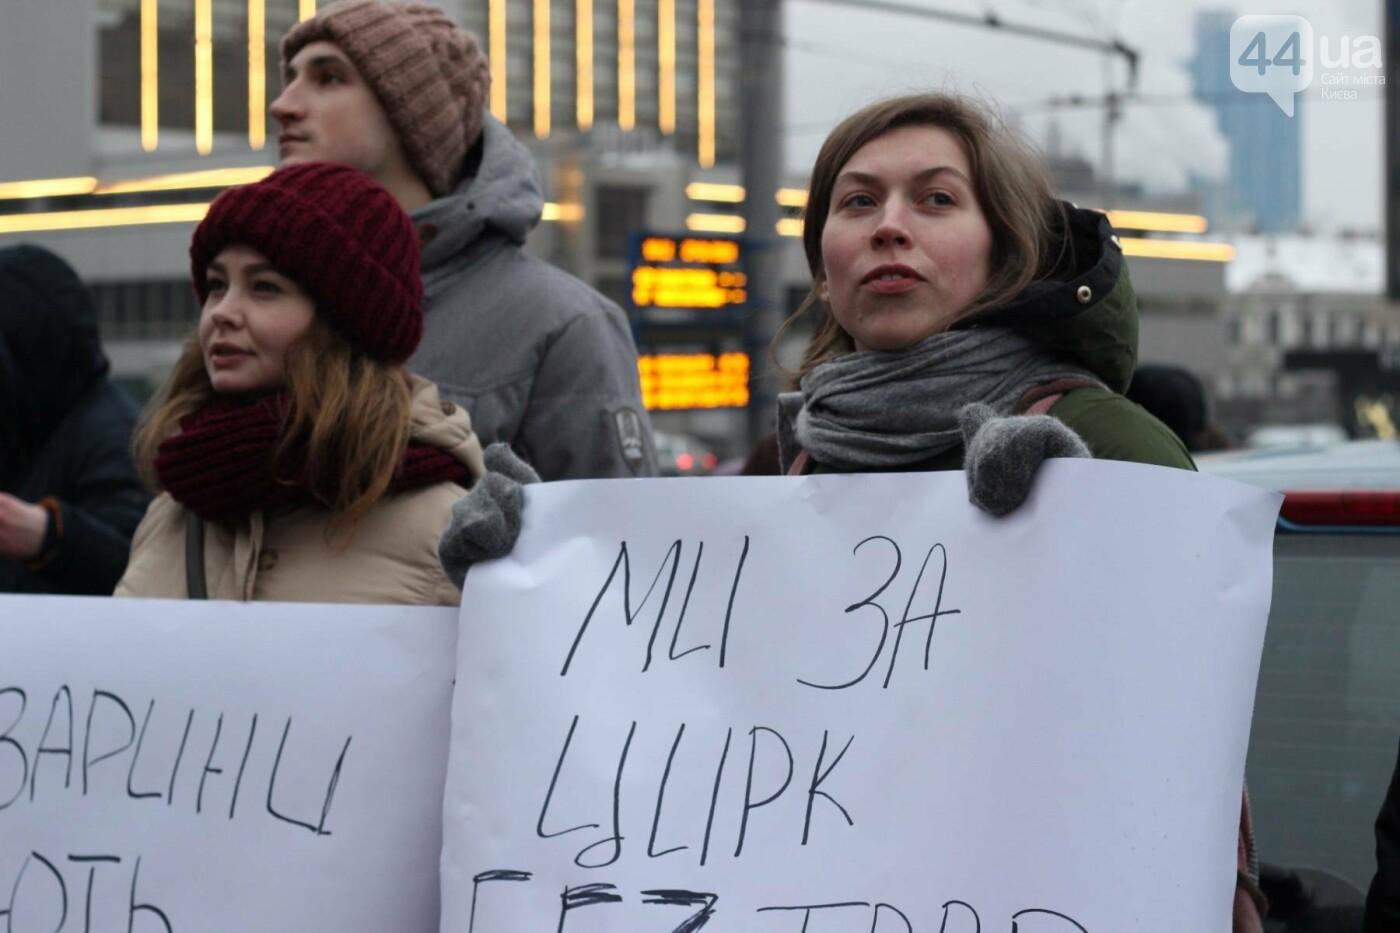 Цирк без животных: как в Киеве прошла акция протеста, фото-20